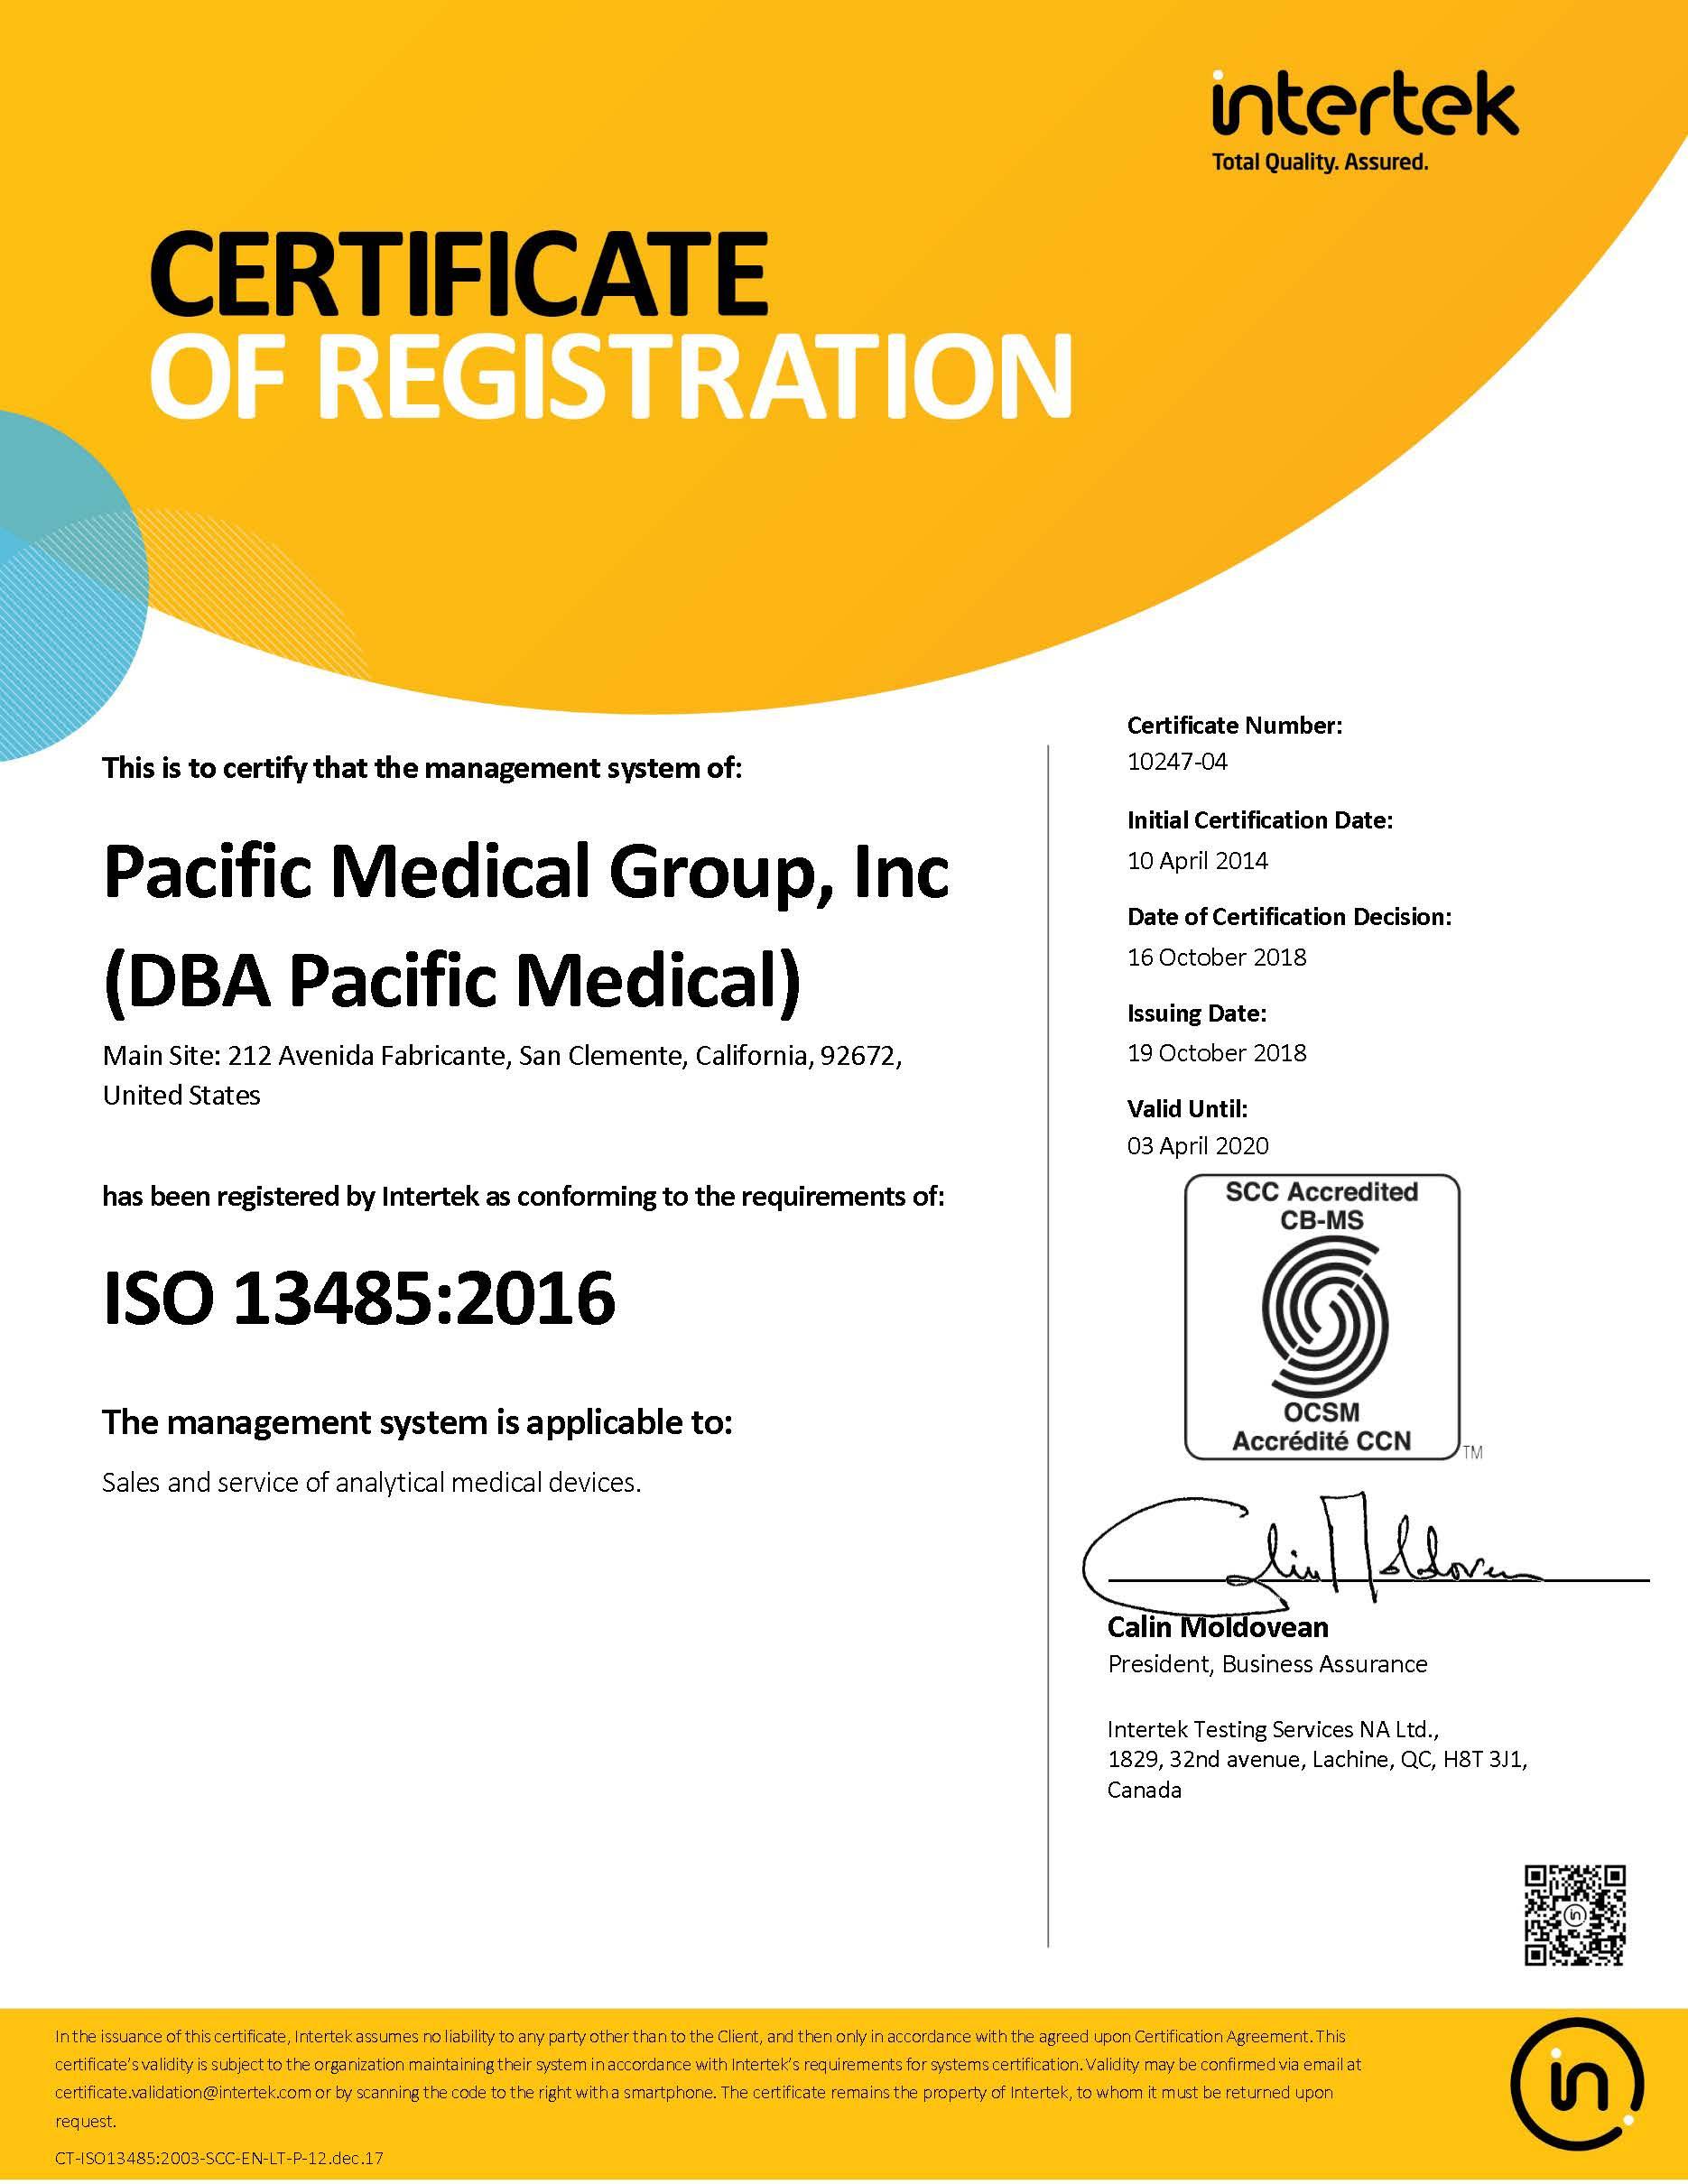 13485-2016-pacific-medical-group-inc-dba-pacific-medical-.jpg